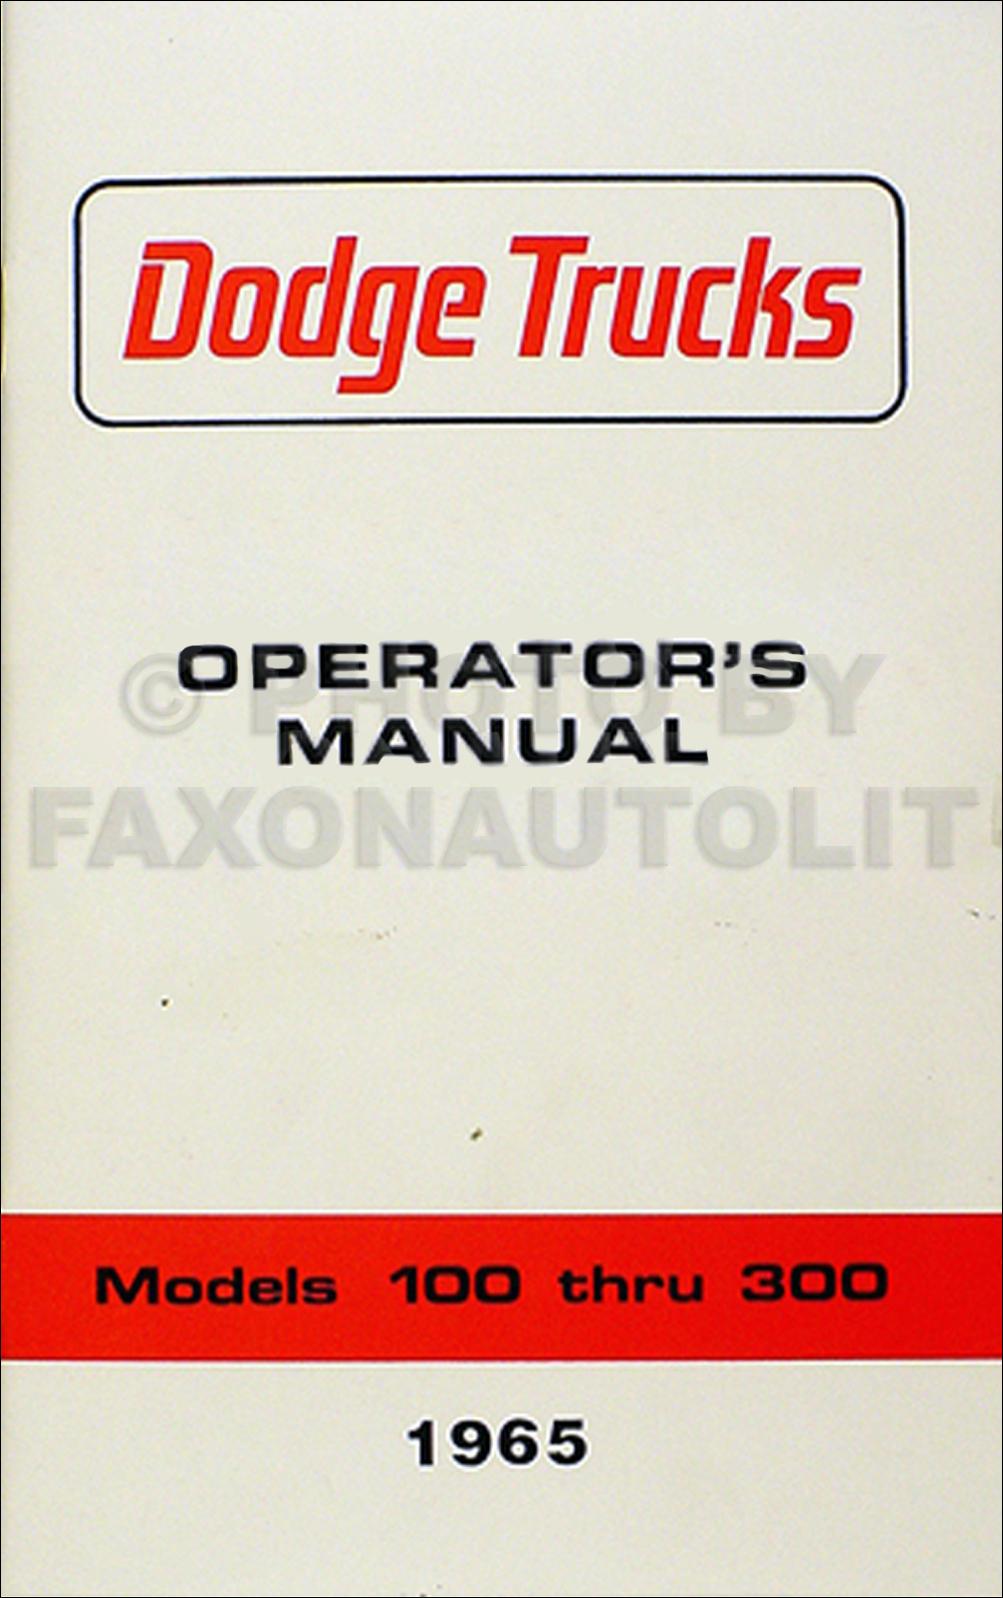 1965 dodge truck owner manual d100 d300 pickup a100 van w100 wm300 rh ebay com dodge truck service manual dodge truck owners manual